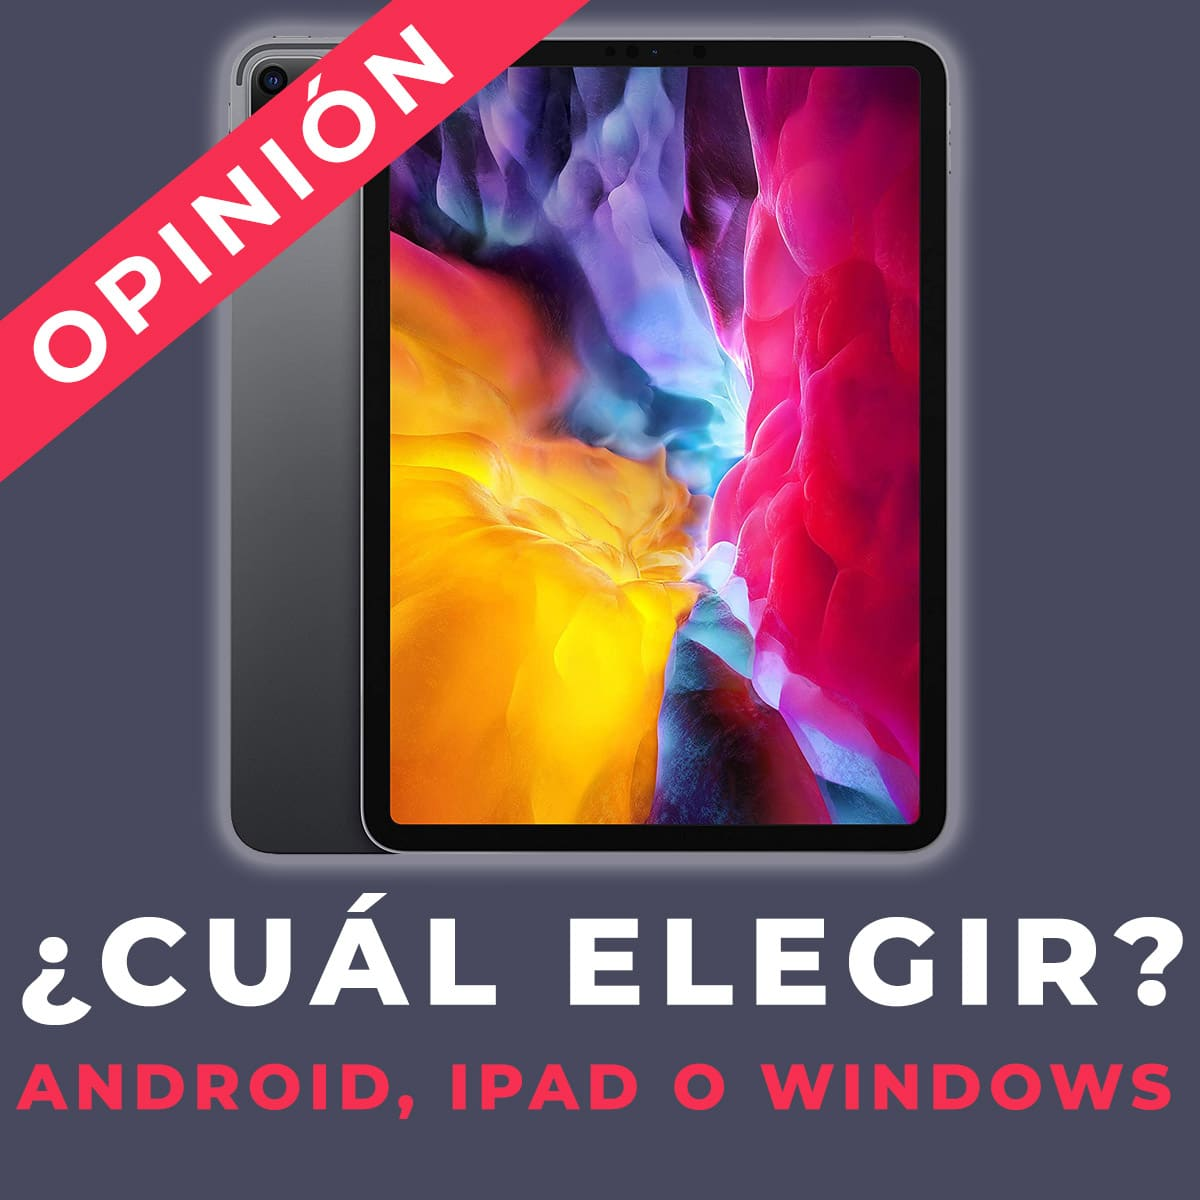 android ipad o windows